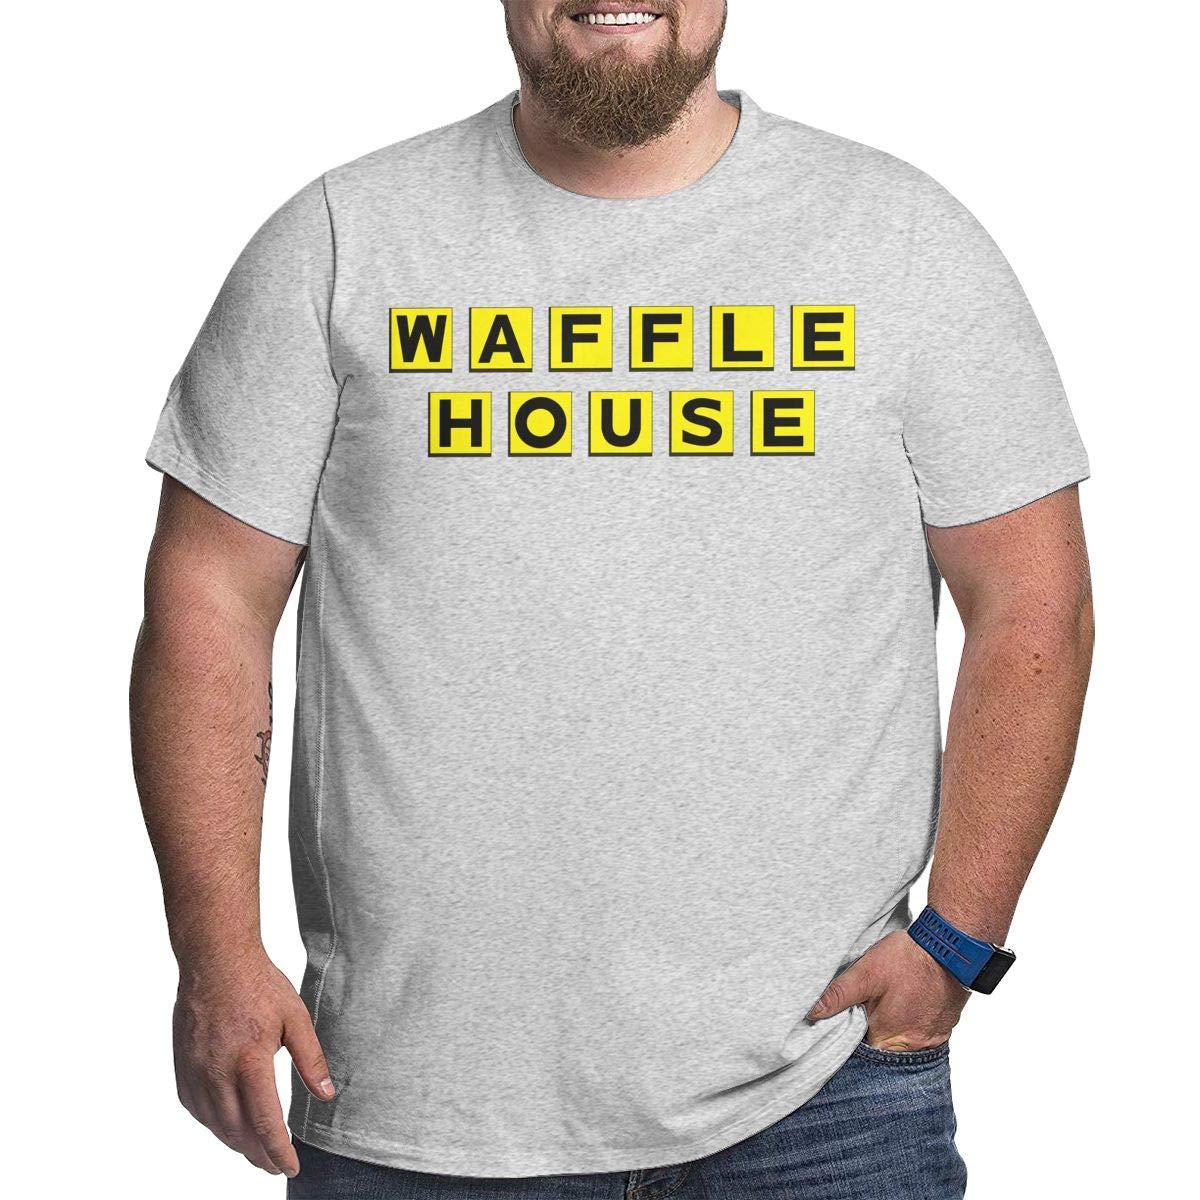 Fat Men's T Shirt Waffle House Logo Tee Shirts T-Shirt Short-Sleeve Round Neck Tshirt for Men Youth Boys Plus Size Gray 5XL by BKashy